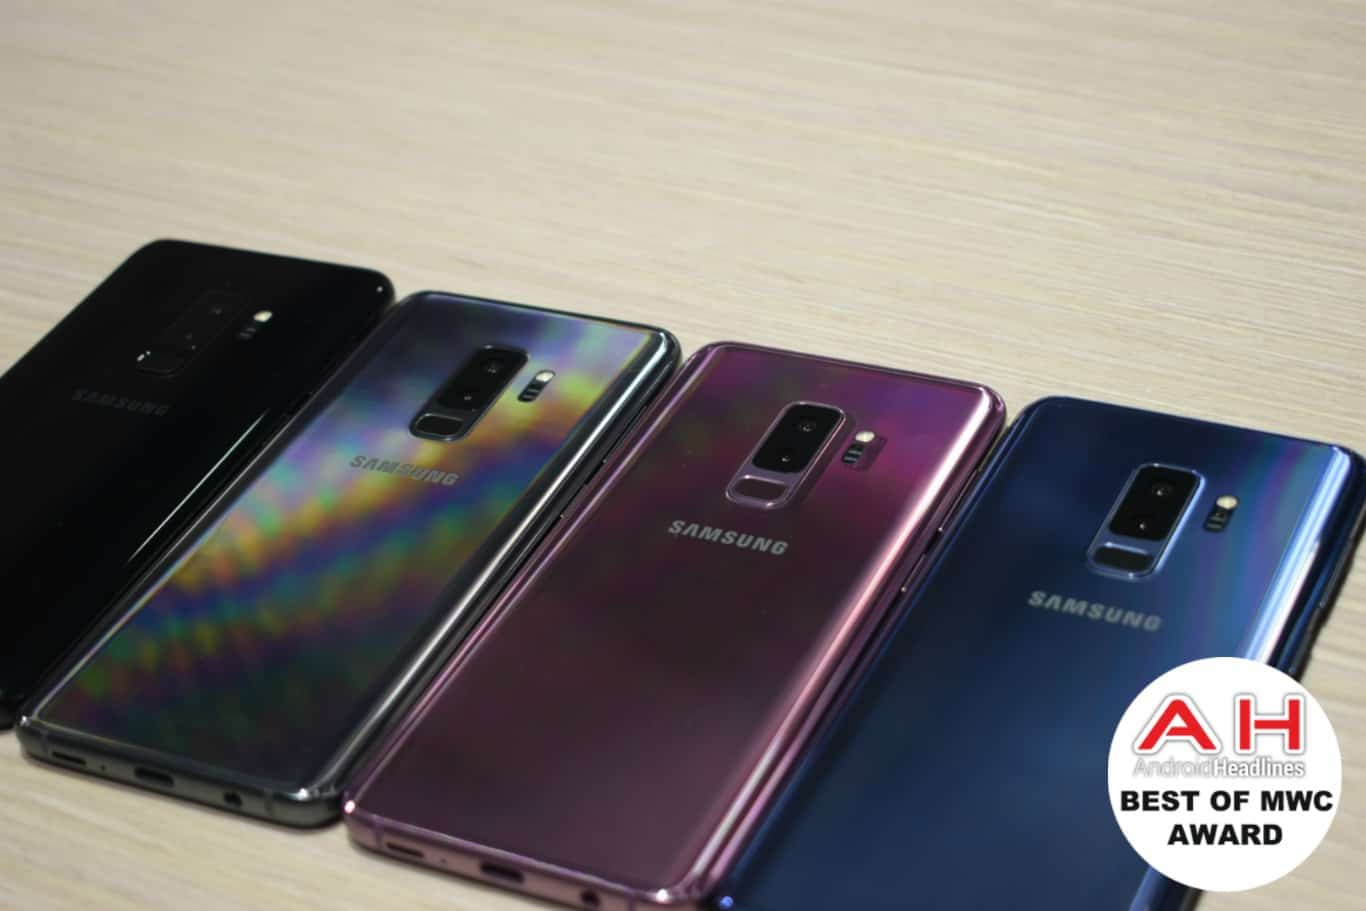 Galaxy S9 Best of MWC AH 01